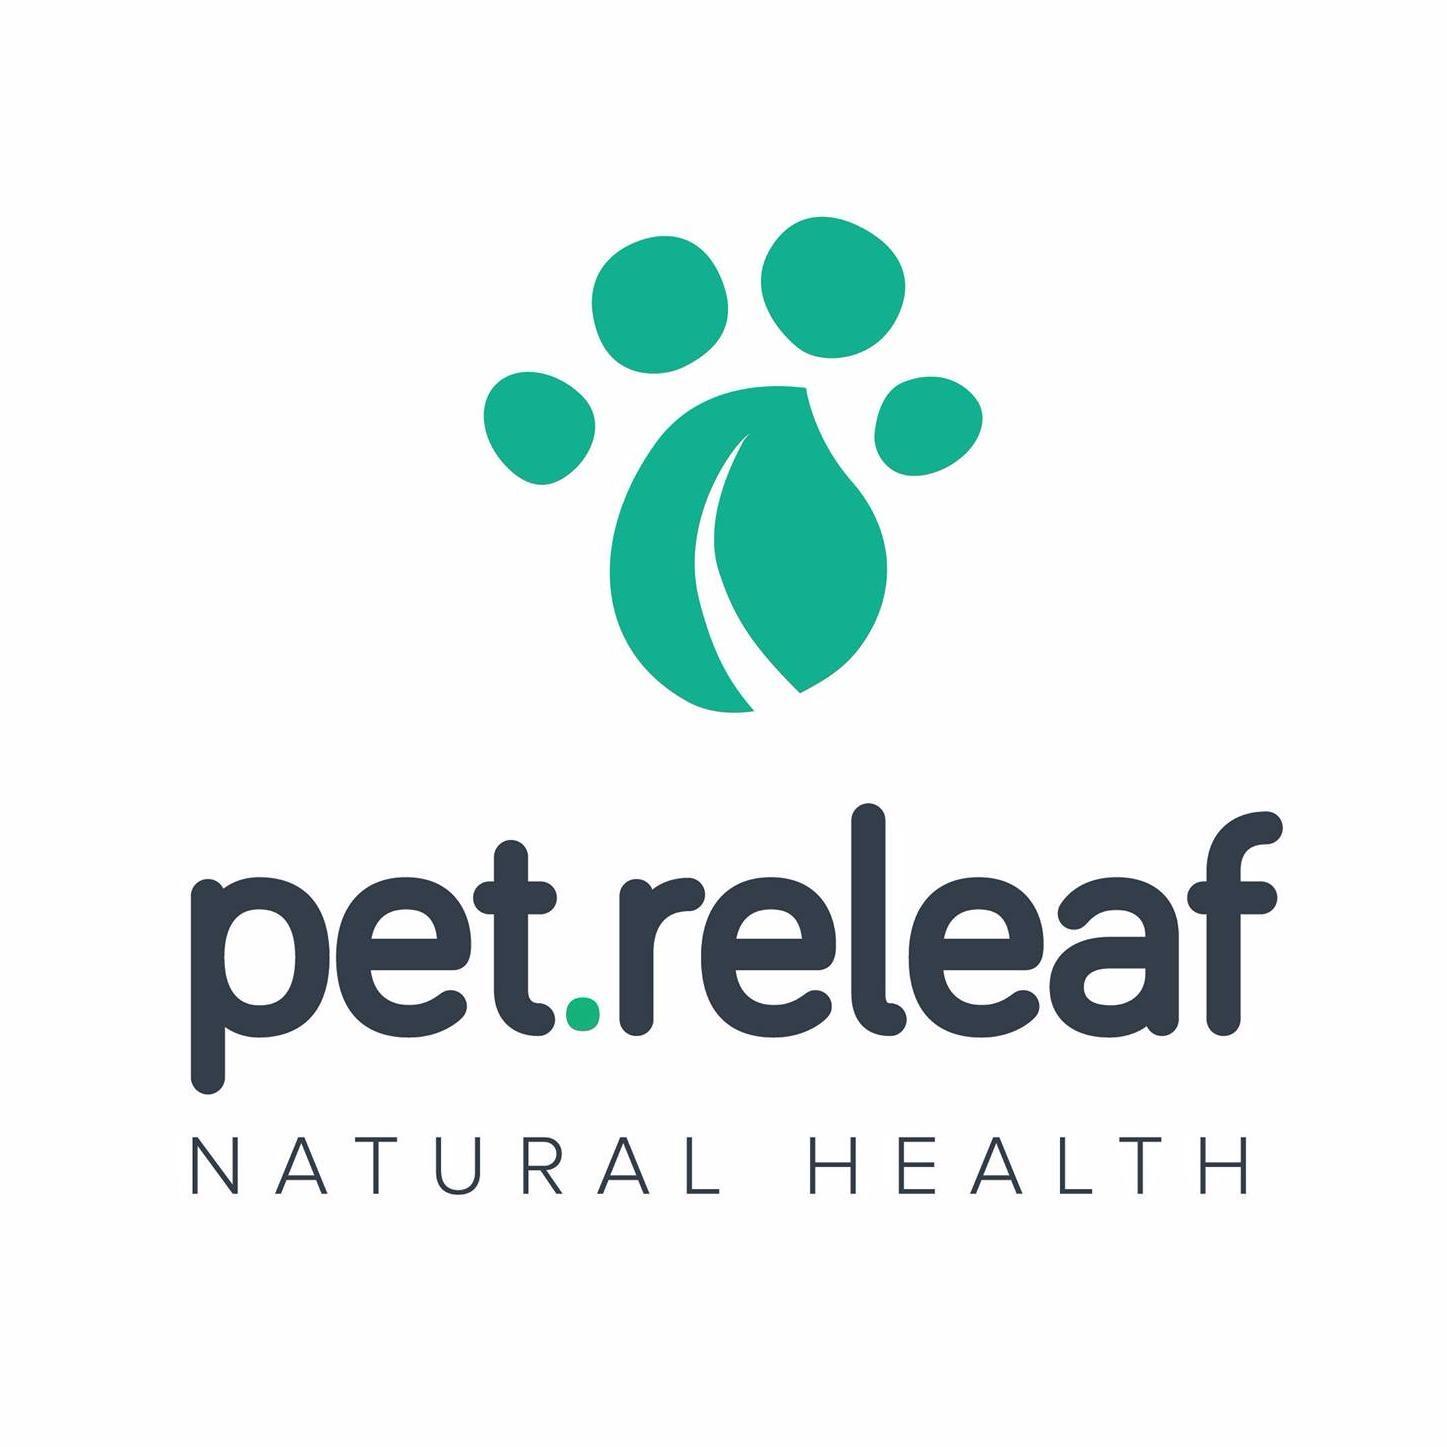 Pet releaf coupon code